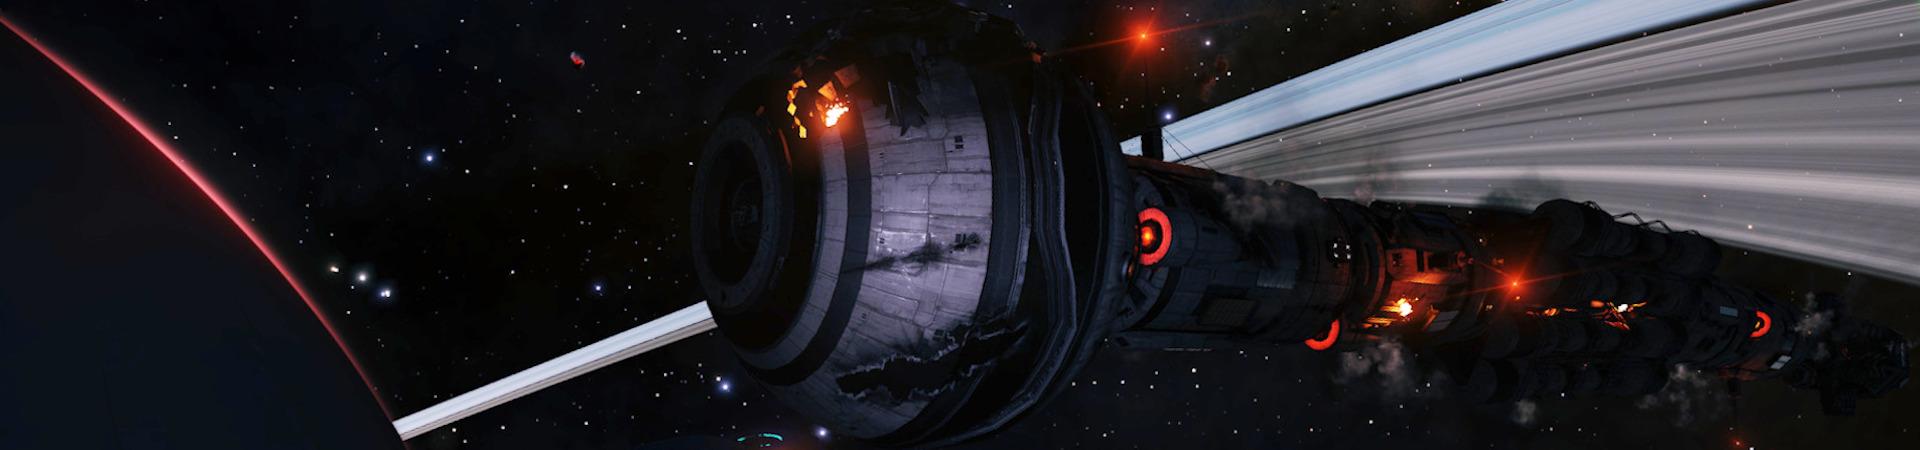 Megaship Adamastor